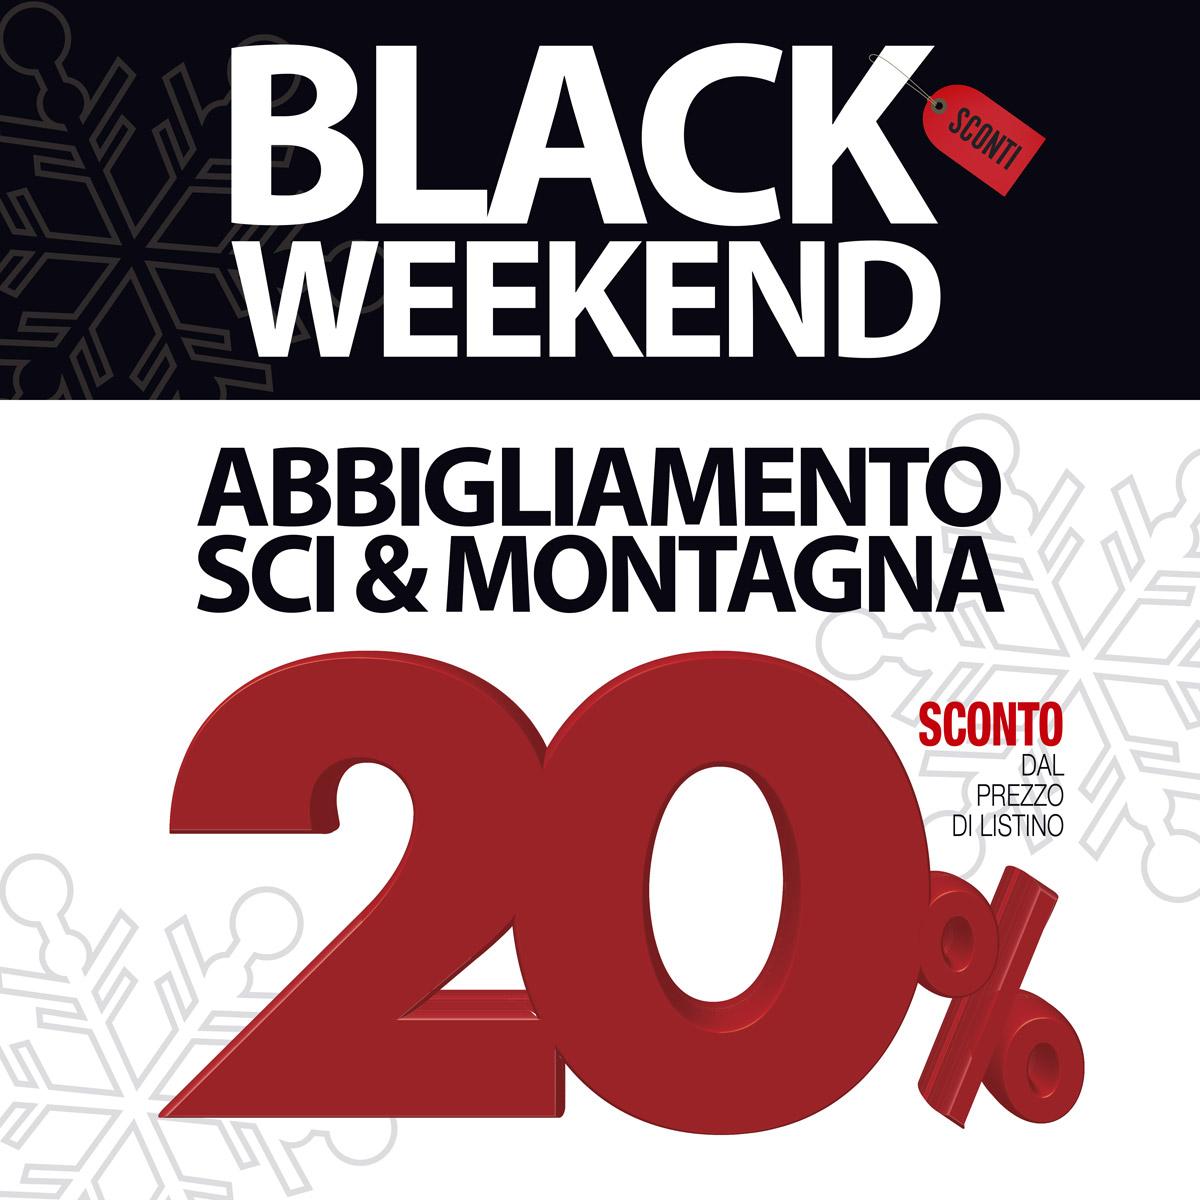 Promo-BORGO2000-ABBIGL-SCIeMONTAGNA_Sconto20_BannerNewsletter